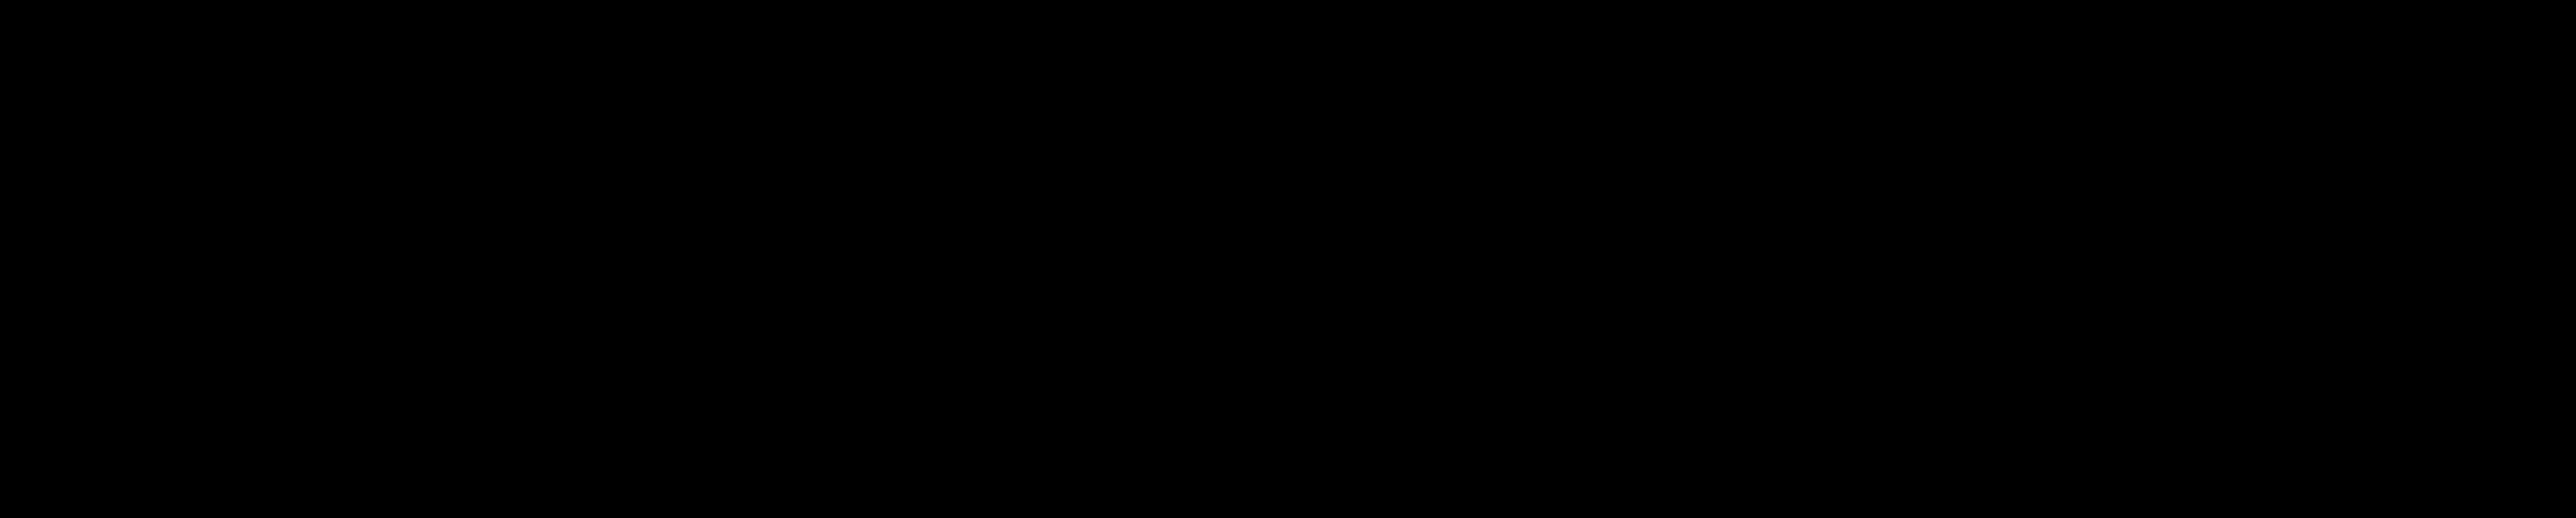 Logo @ljunghusen Ljunghusen #ljunghusen